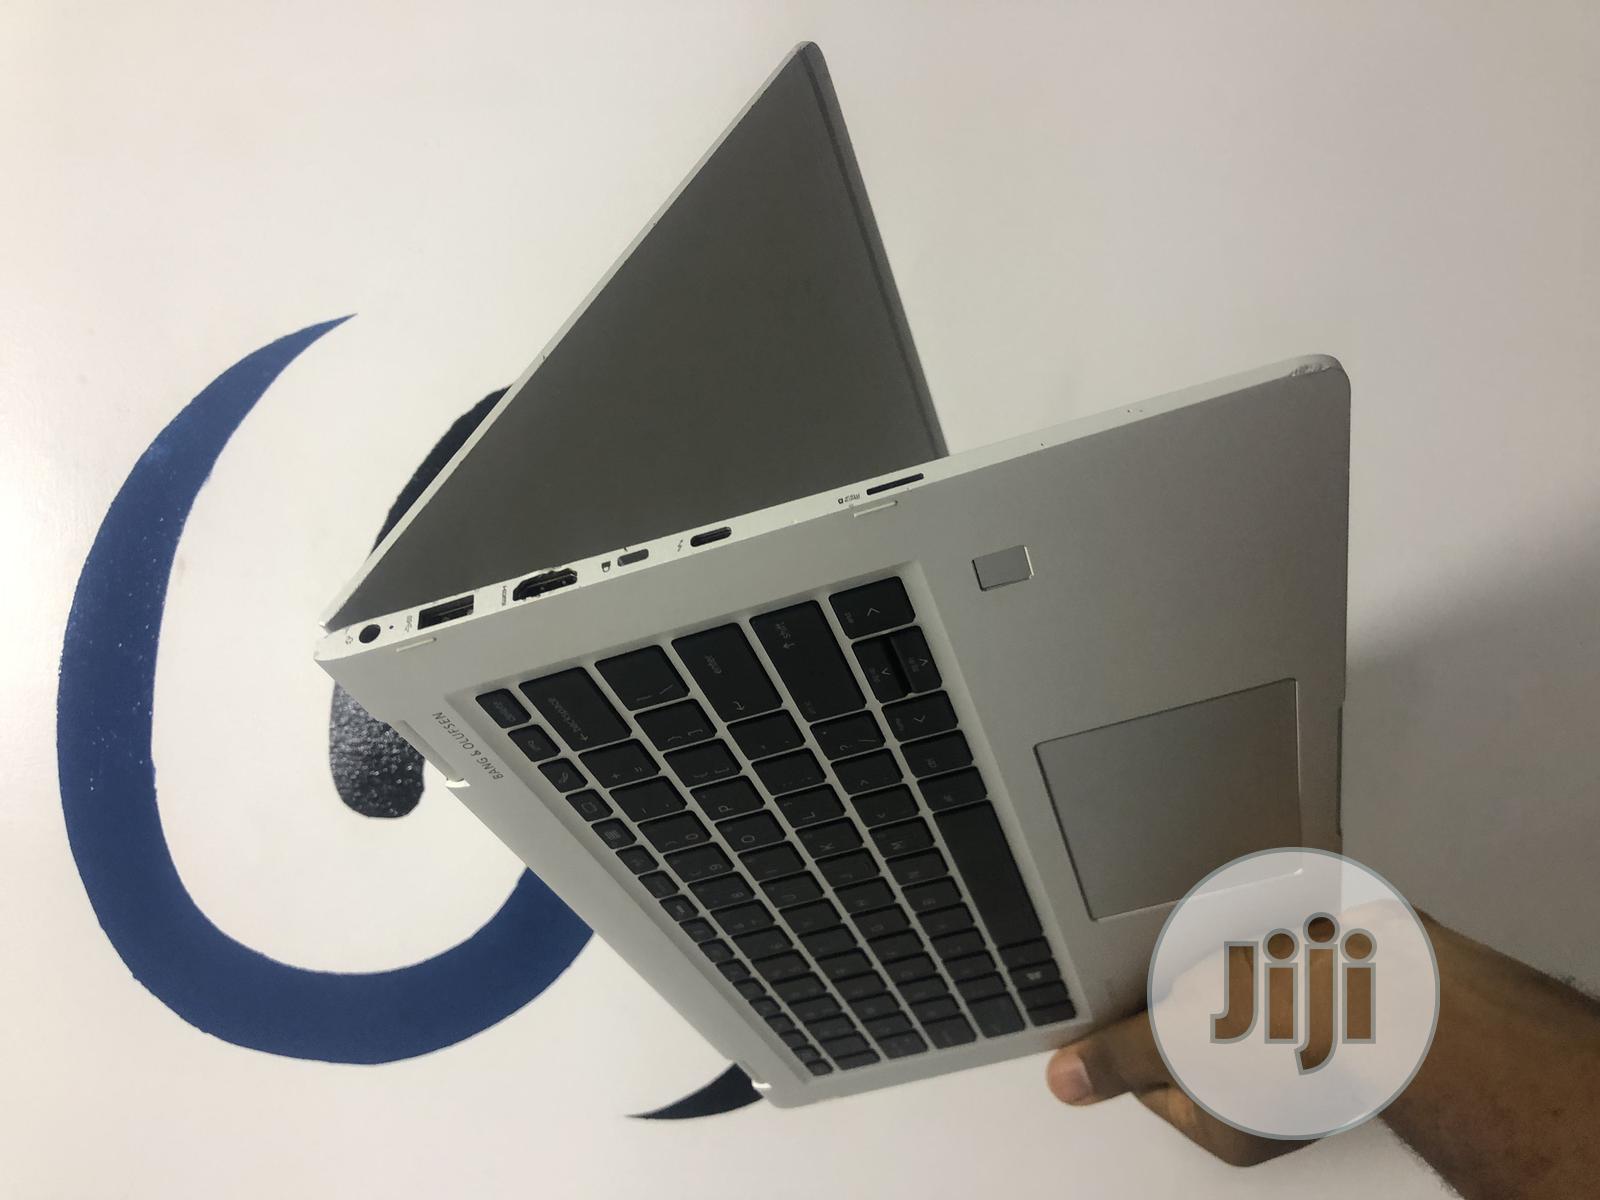 Laptop HP EliteBook X360 1030 G2 8GB Intel Core I5 SSD 256GB | Laptops & Computers for sale in Ikeja, Lagos State, Nigeria